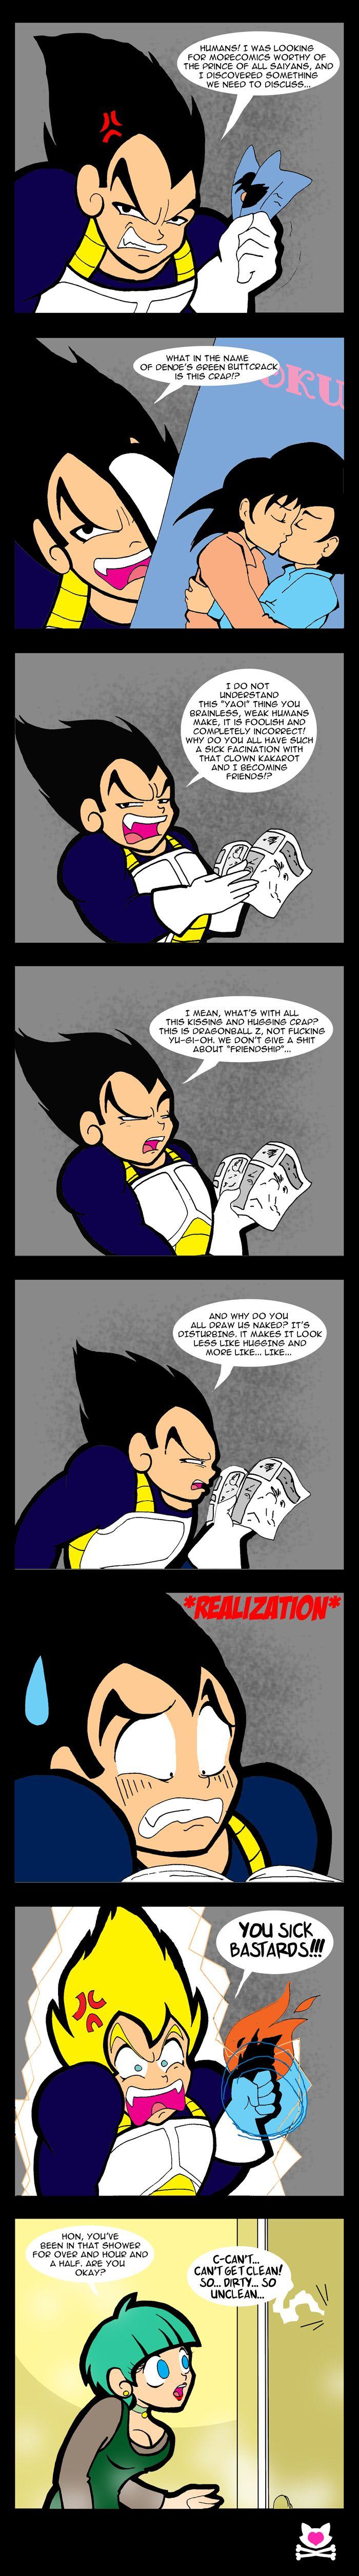 Puro Yu Gi Oh Yugioh Anime Memes Funny Anime Funny